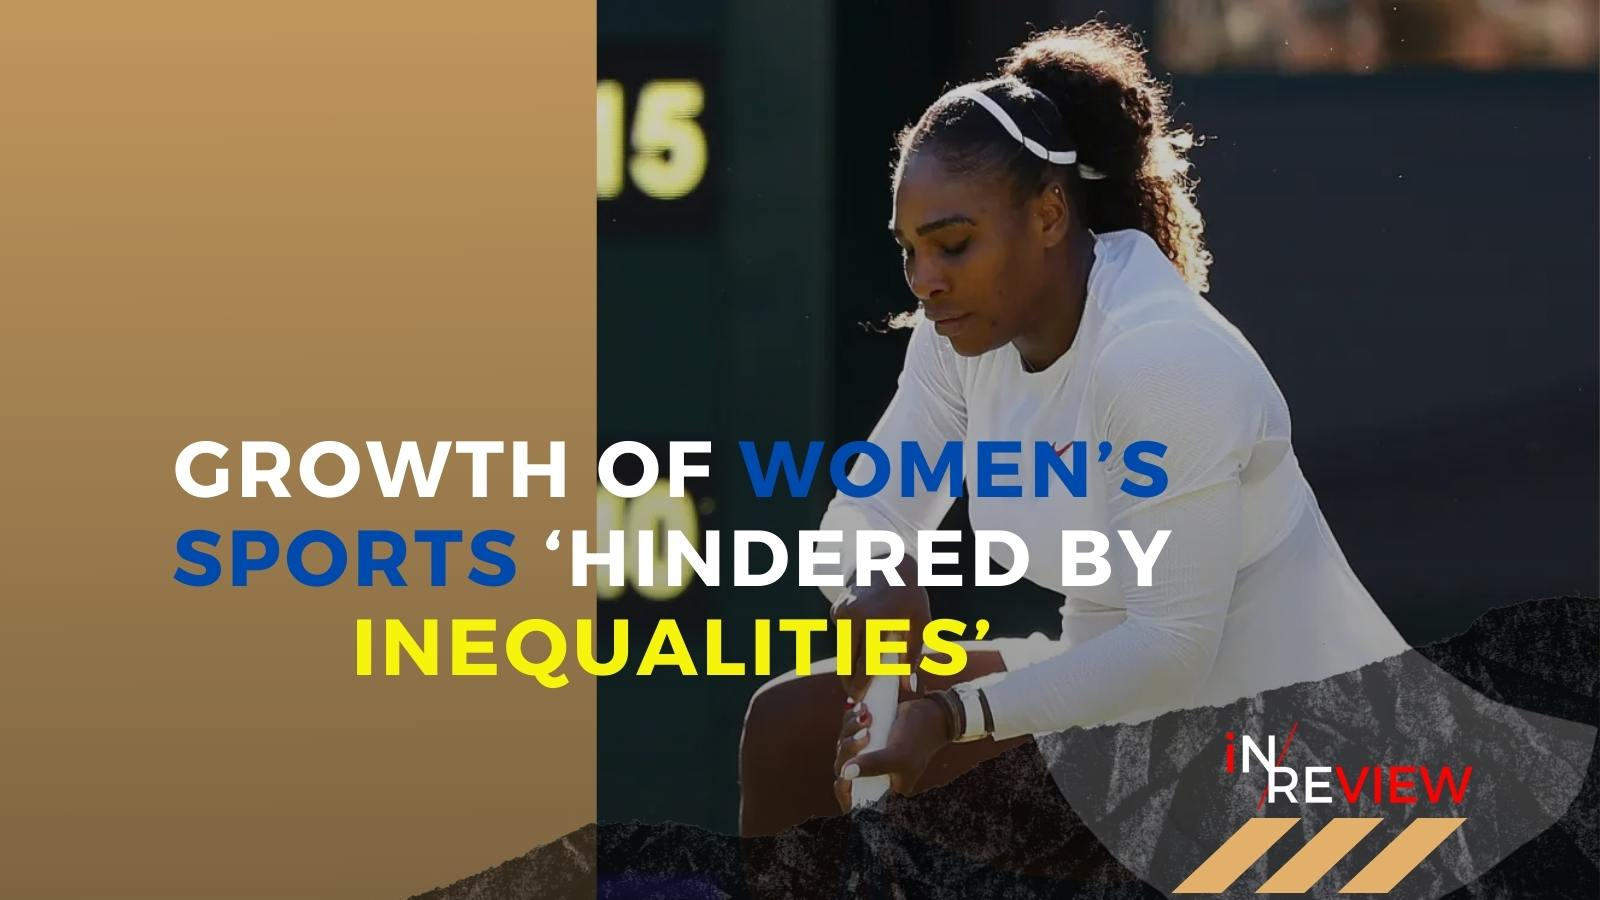 The Gender Pay Gap In Sports, Will Emma Raducanu Change It?